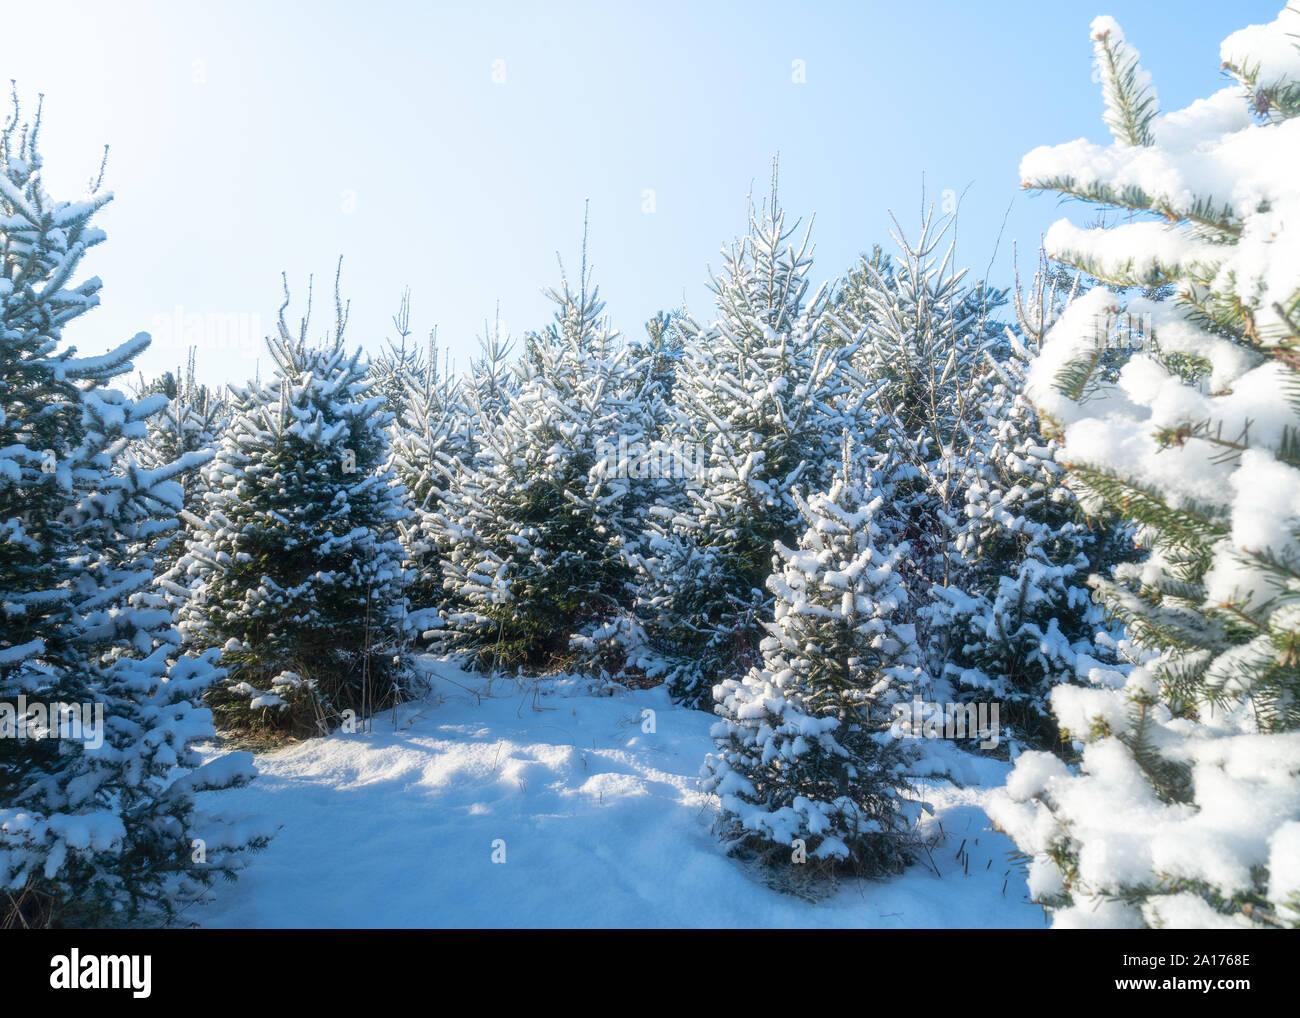 Snow Covered Trees At A Christmas Tree Farm Stock Photo Alamy